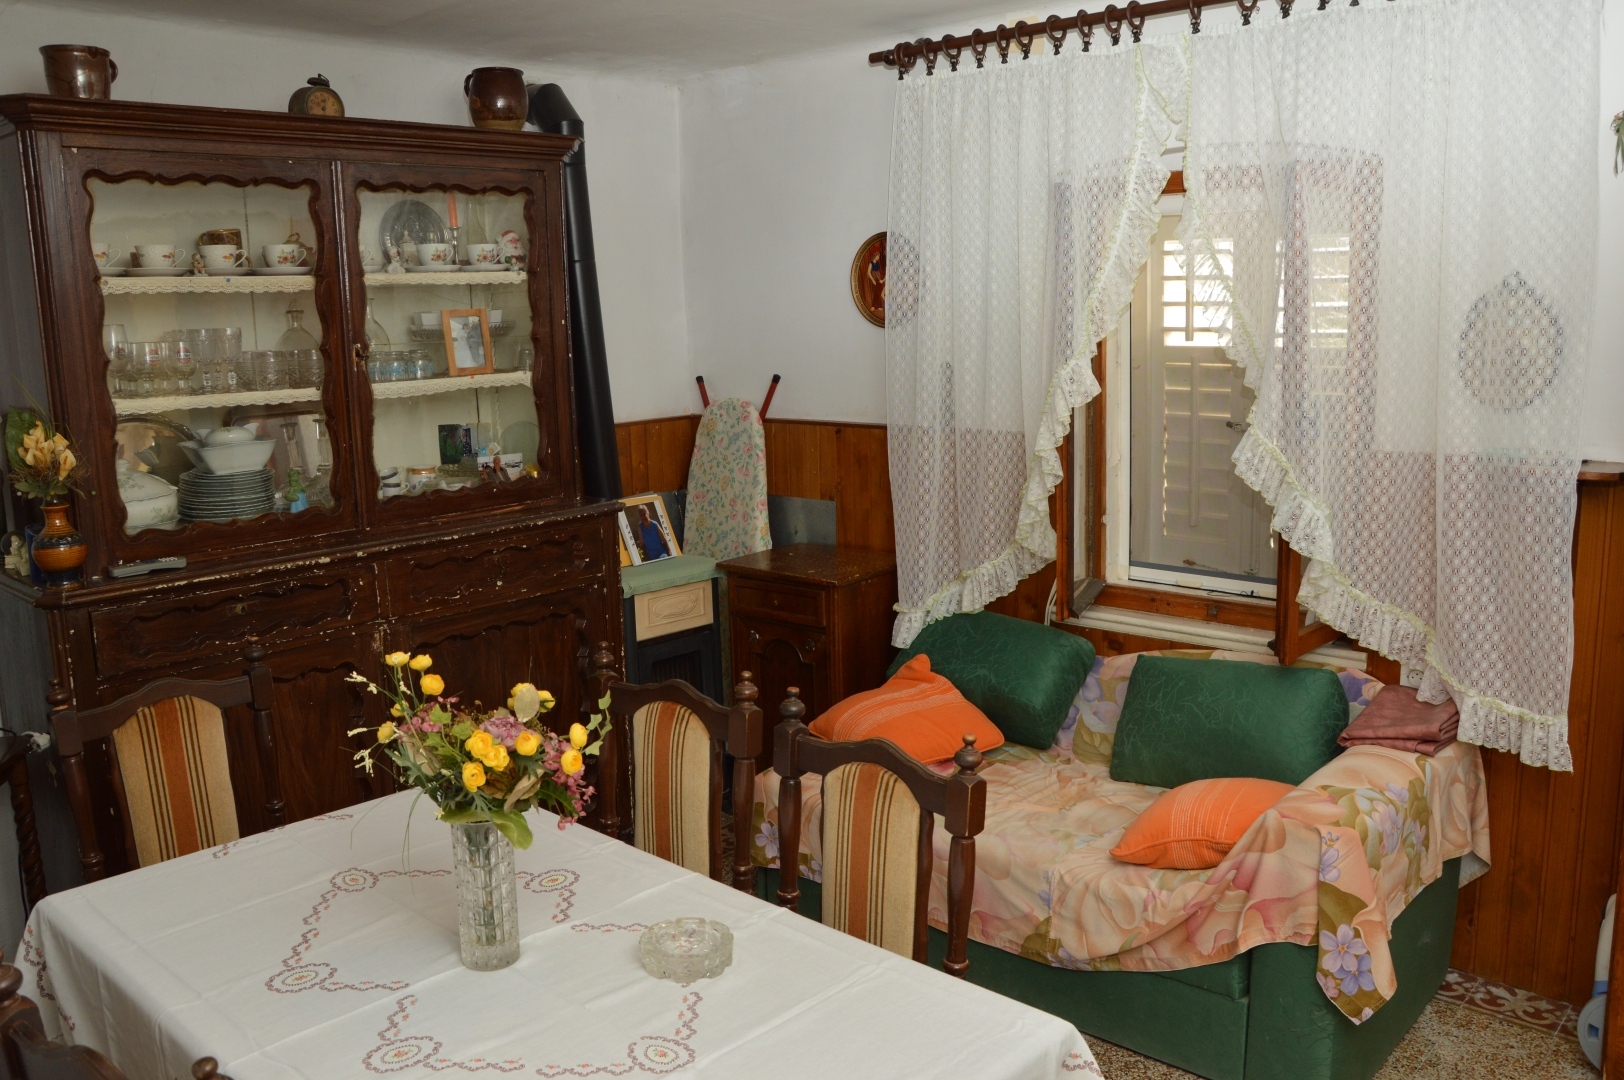 new concept fresh styles quite nice Casa Iva, Casa Iva, Casa di vacanze